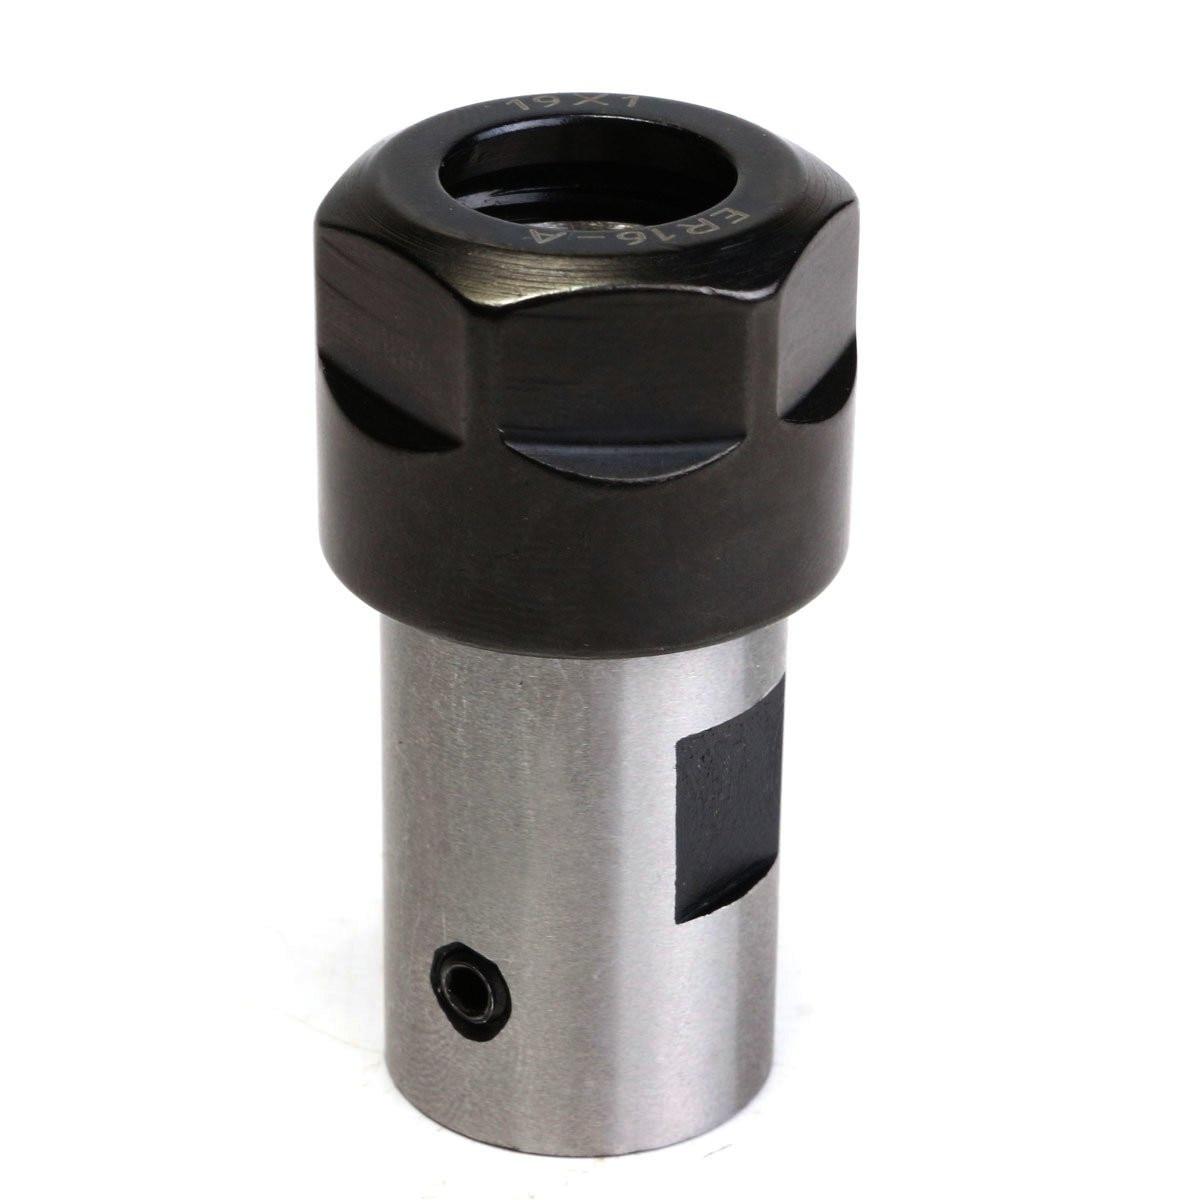 1pcs ER16 Collet Chuck Motor Shaft Extension Rod Spindle Lathe Tools 8MM Milling Boring CNC Milling